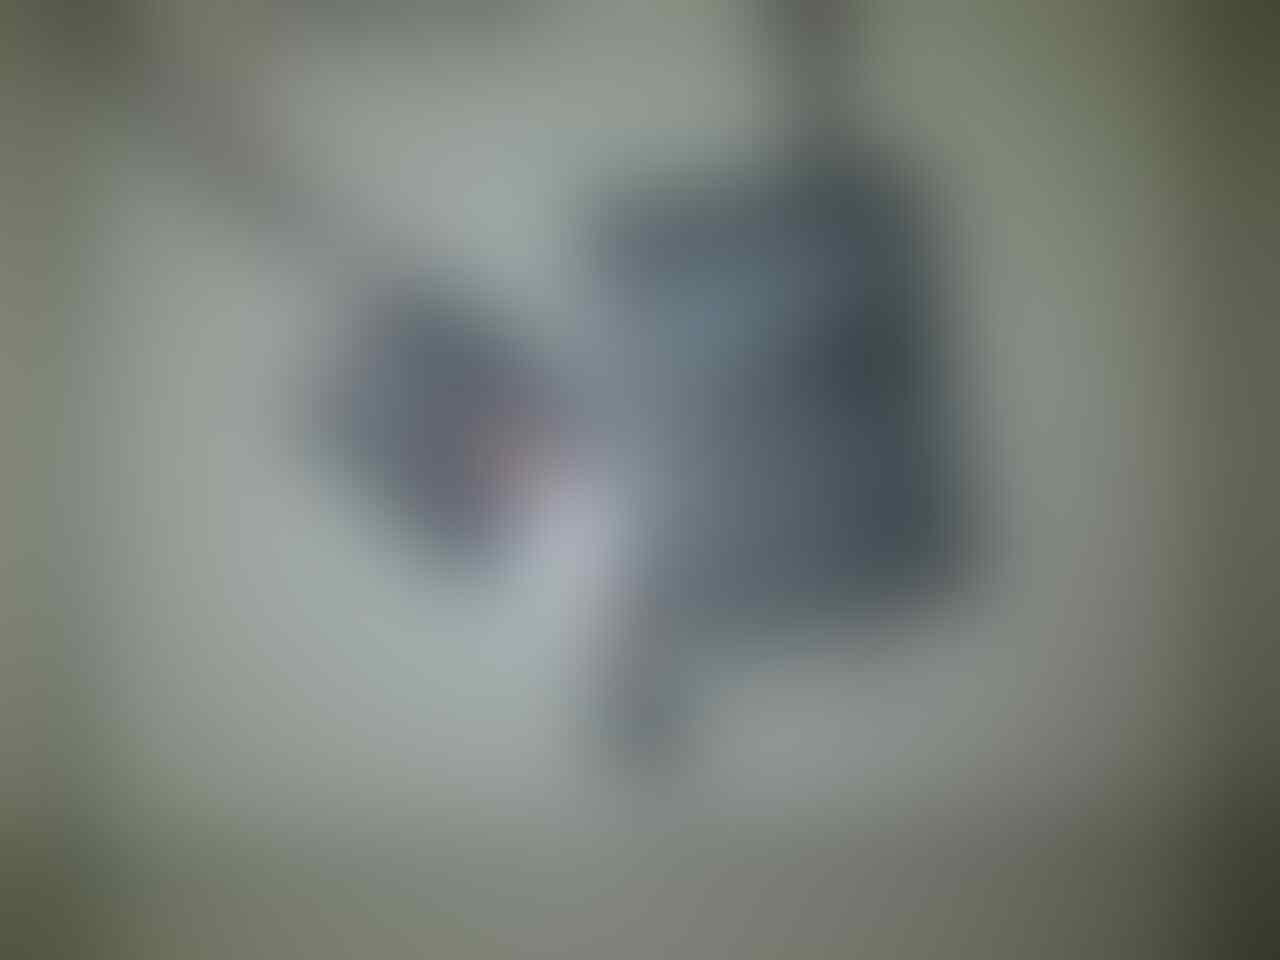 Modul Sirine 6, 7, 12, 13, 9 suara, polisi, patwal BM, murah, MIC, + TOA, VIDEO siap